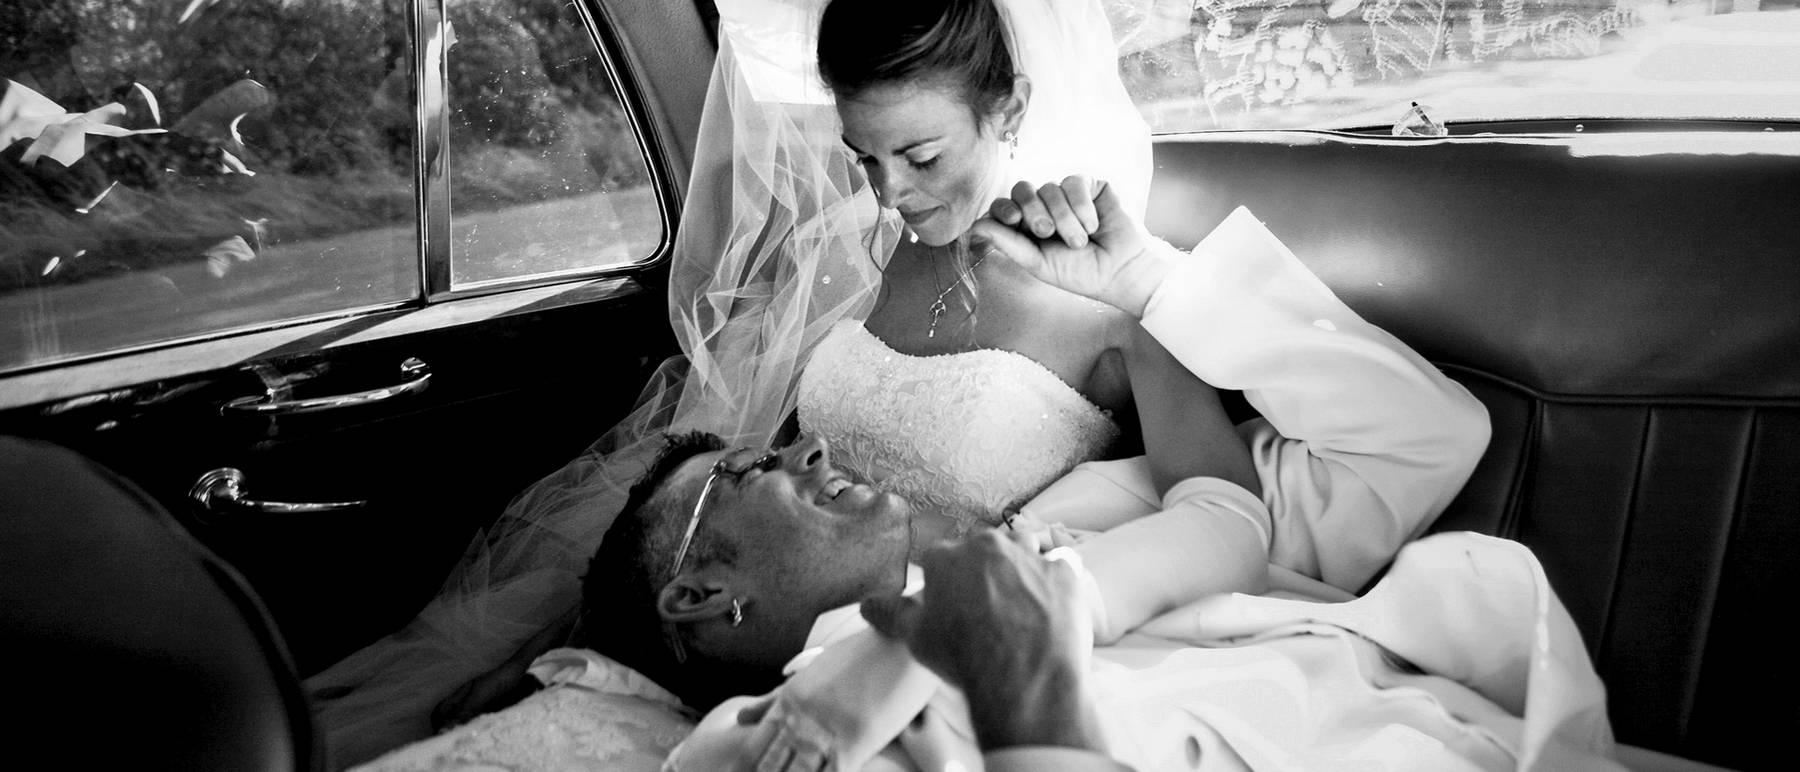 johnandjoseph-wedding-photographer-hz-slider-283